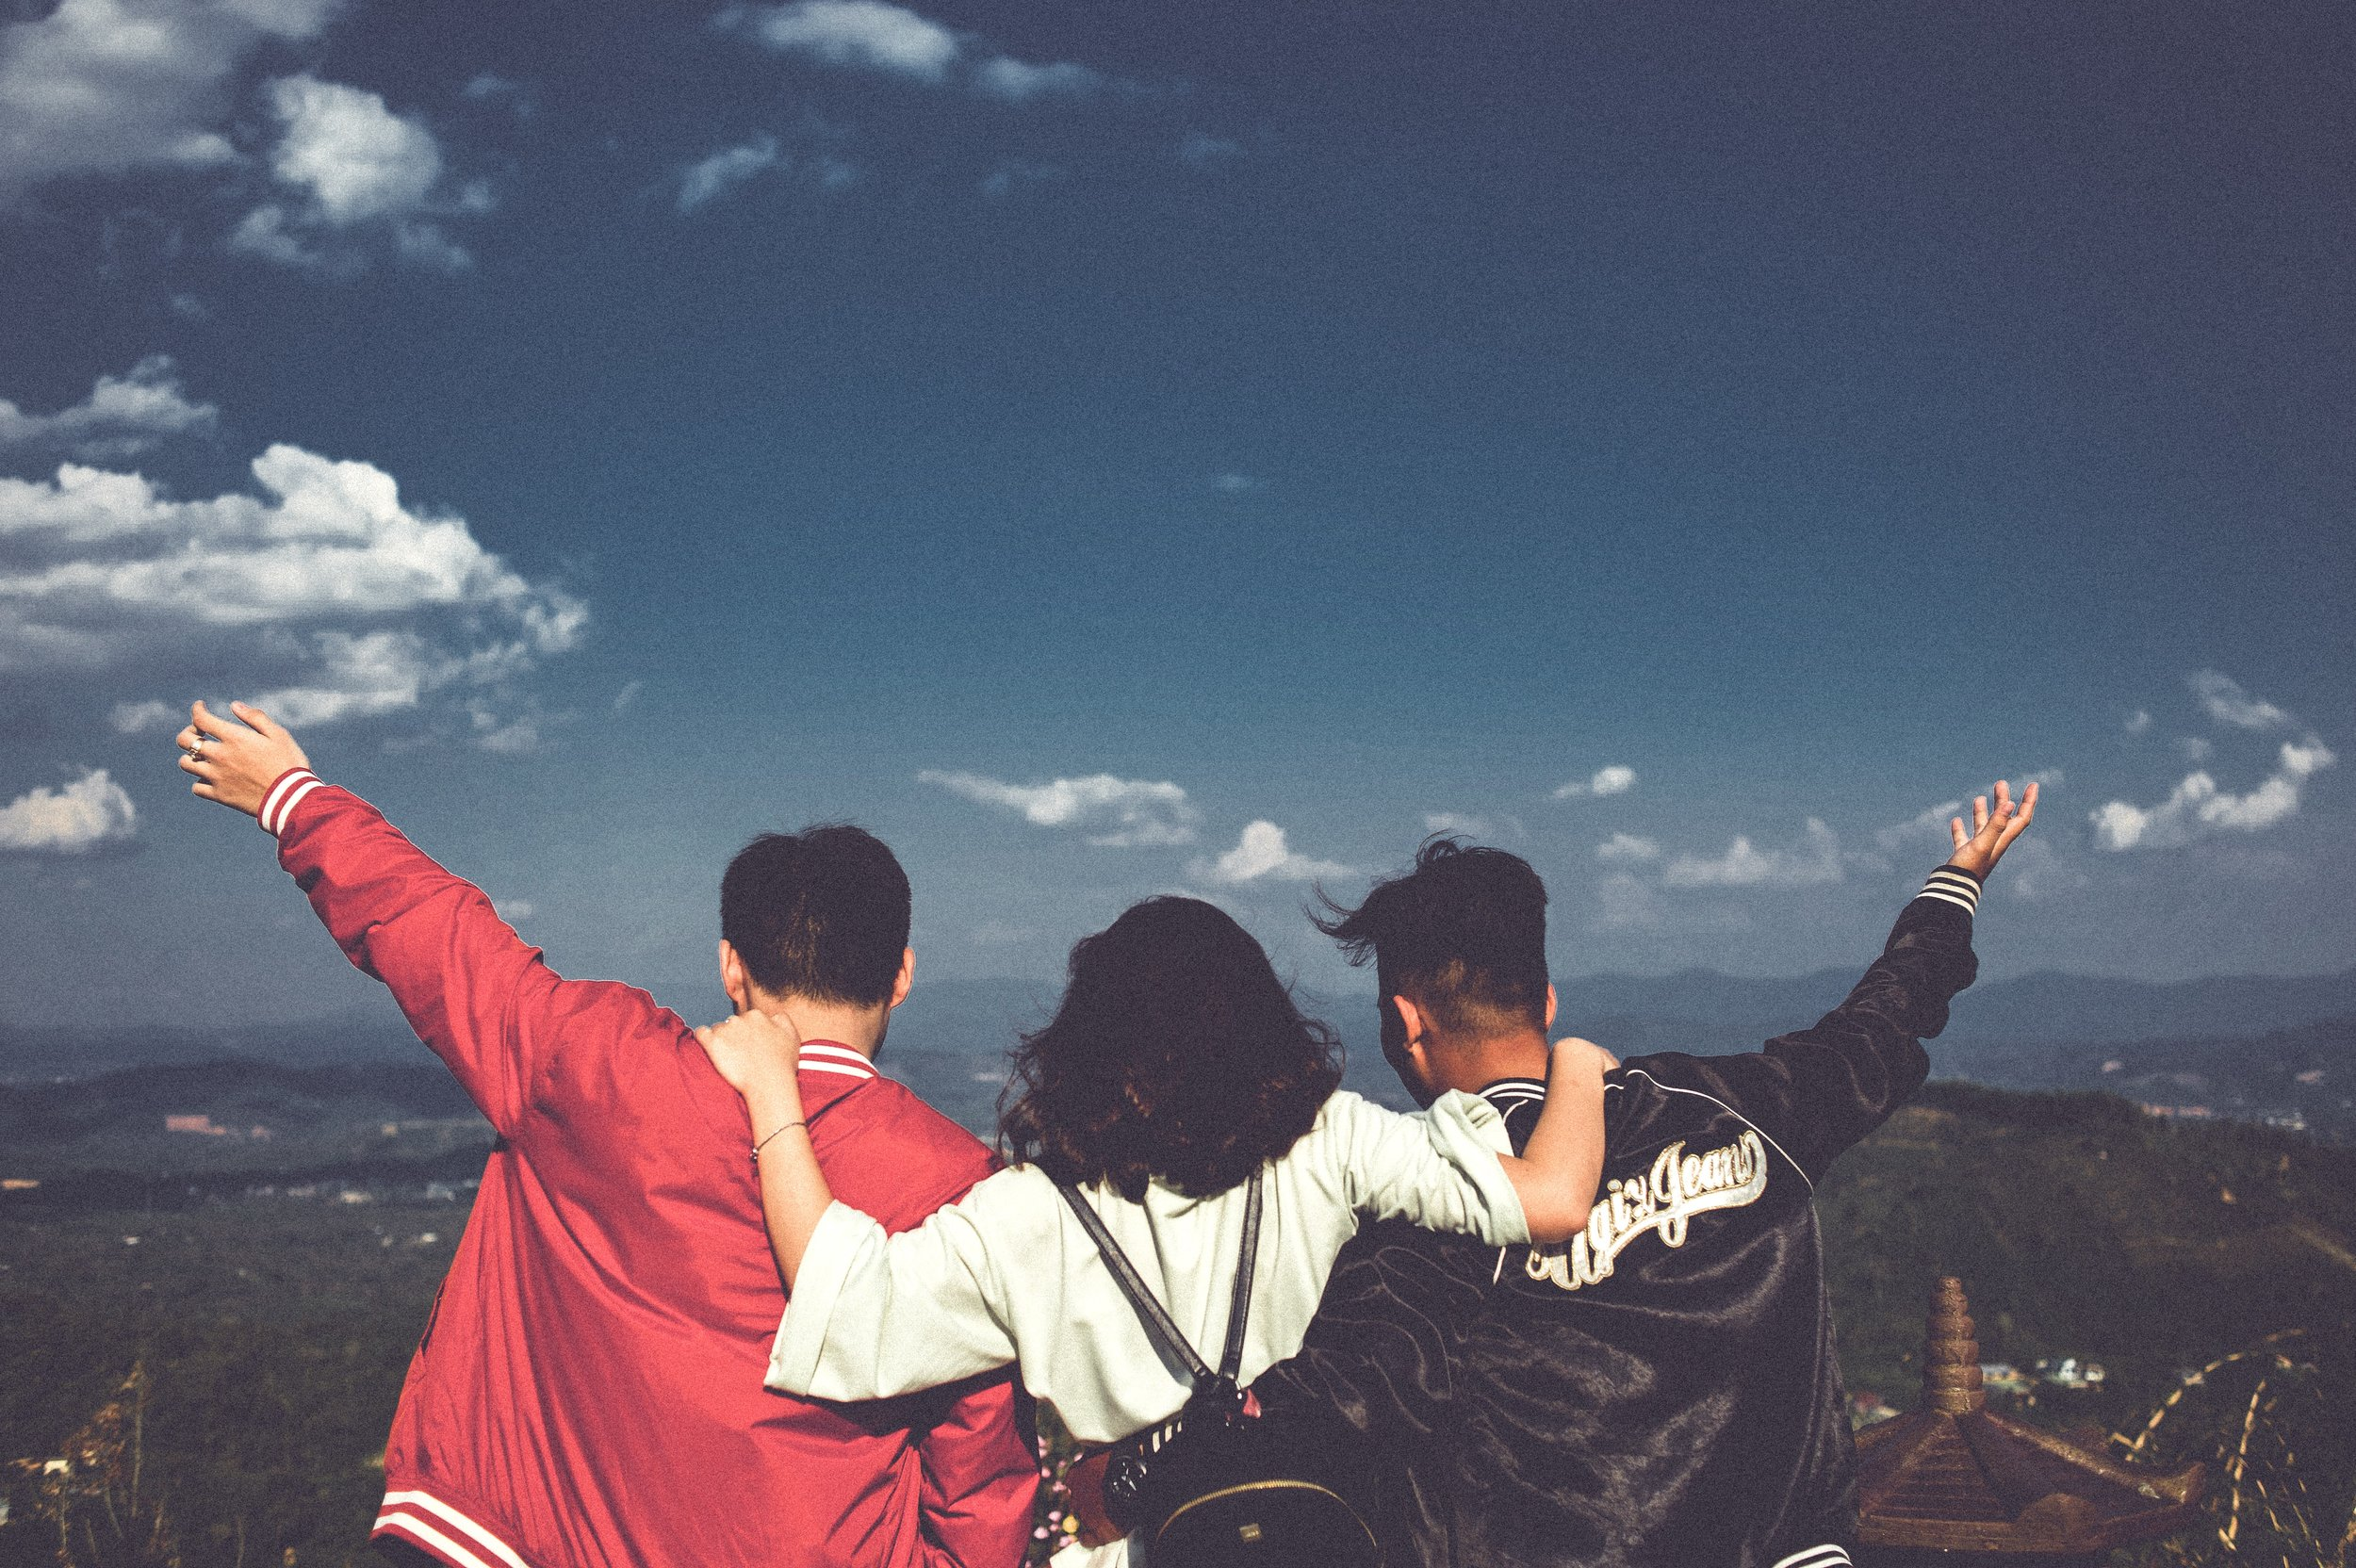 boys-friends-girl-1255061.jpg